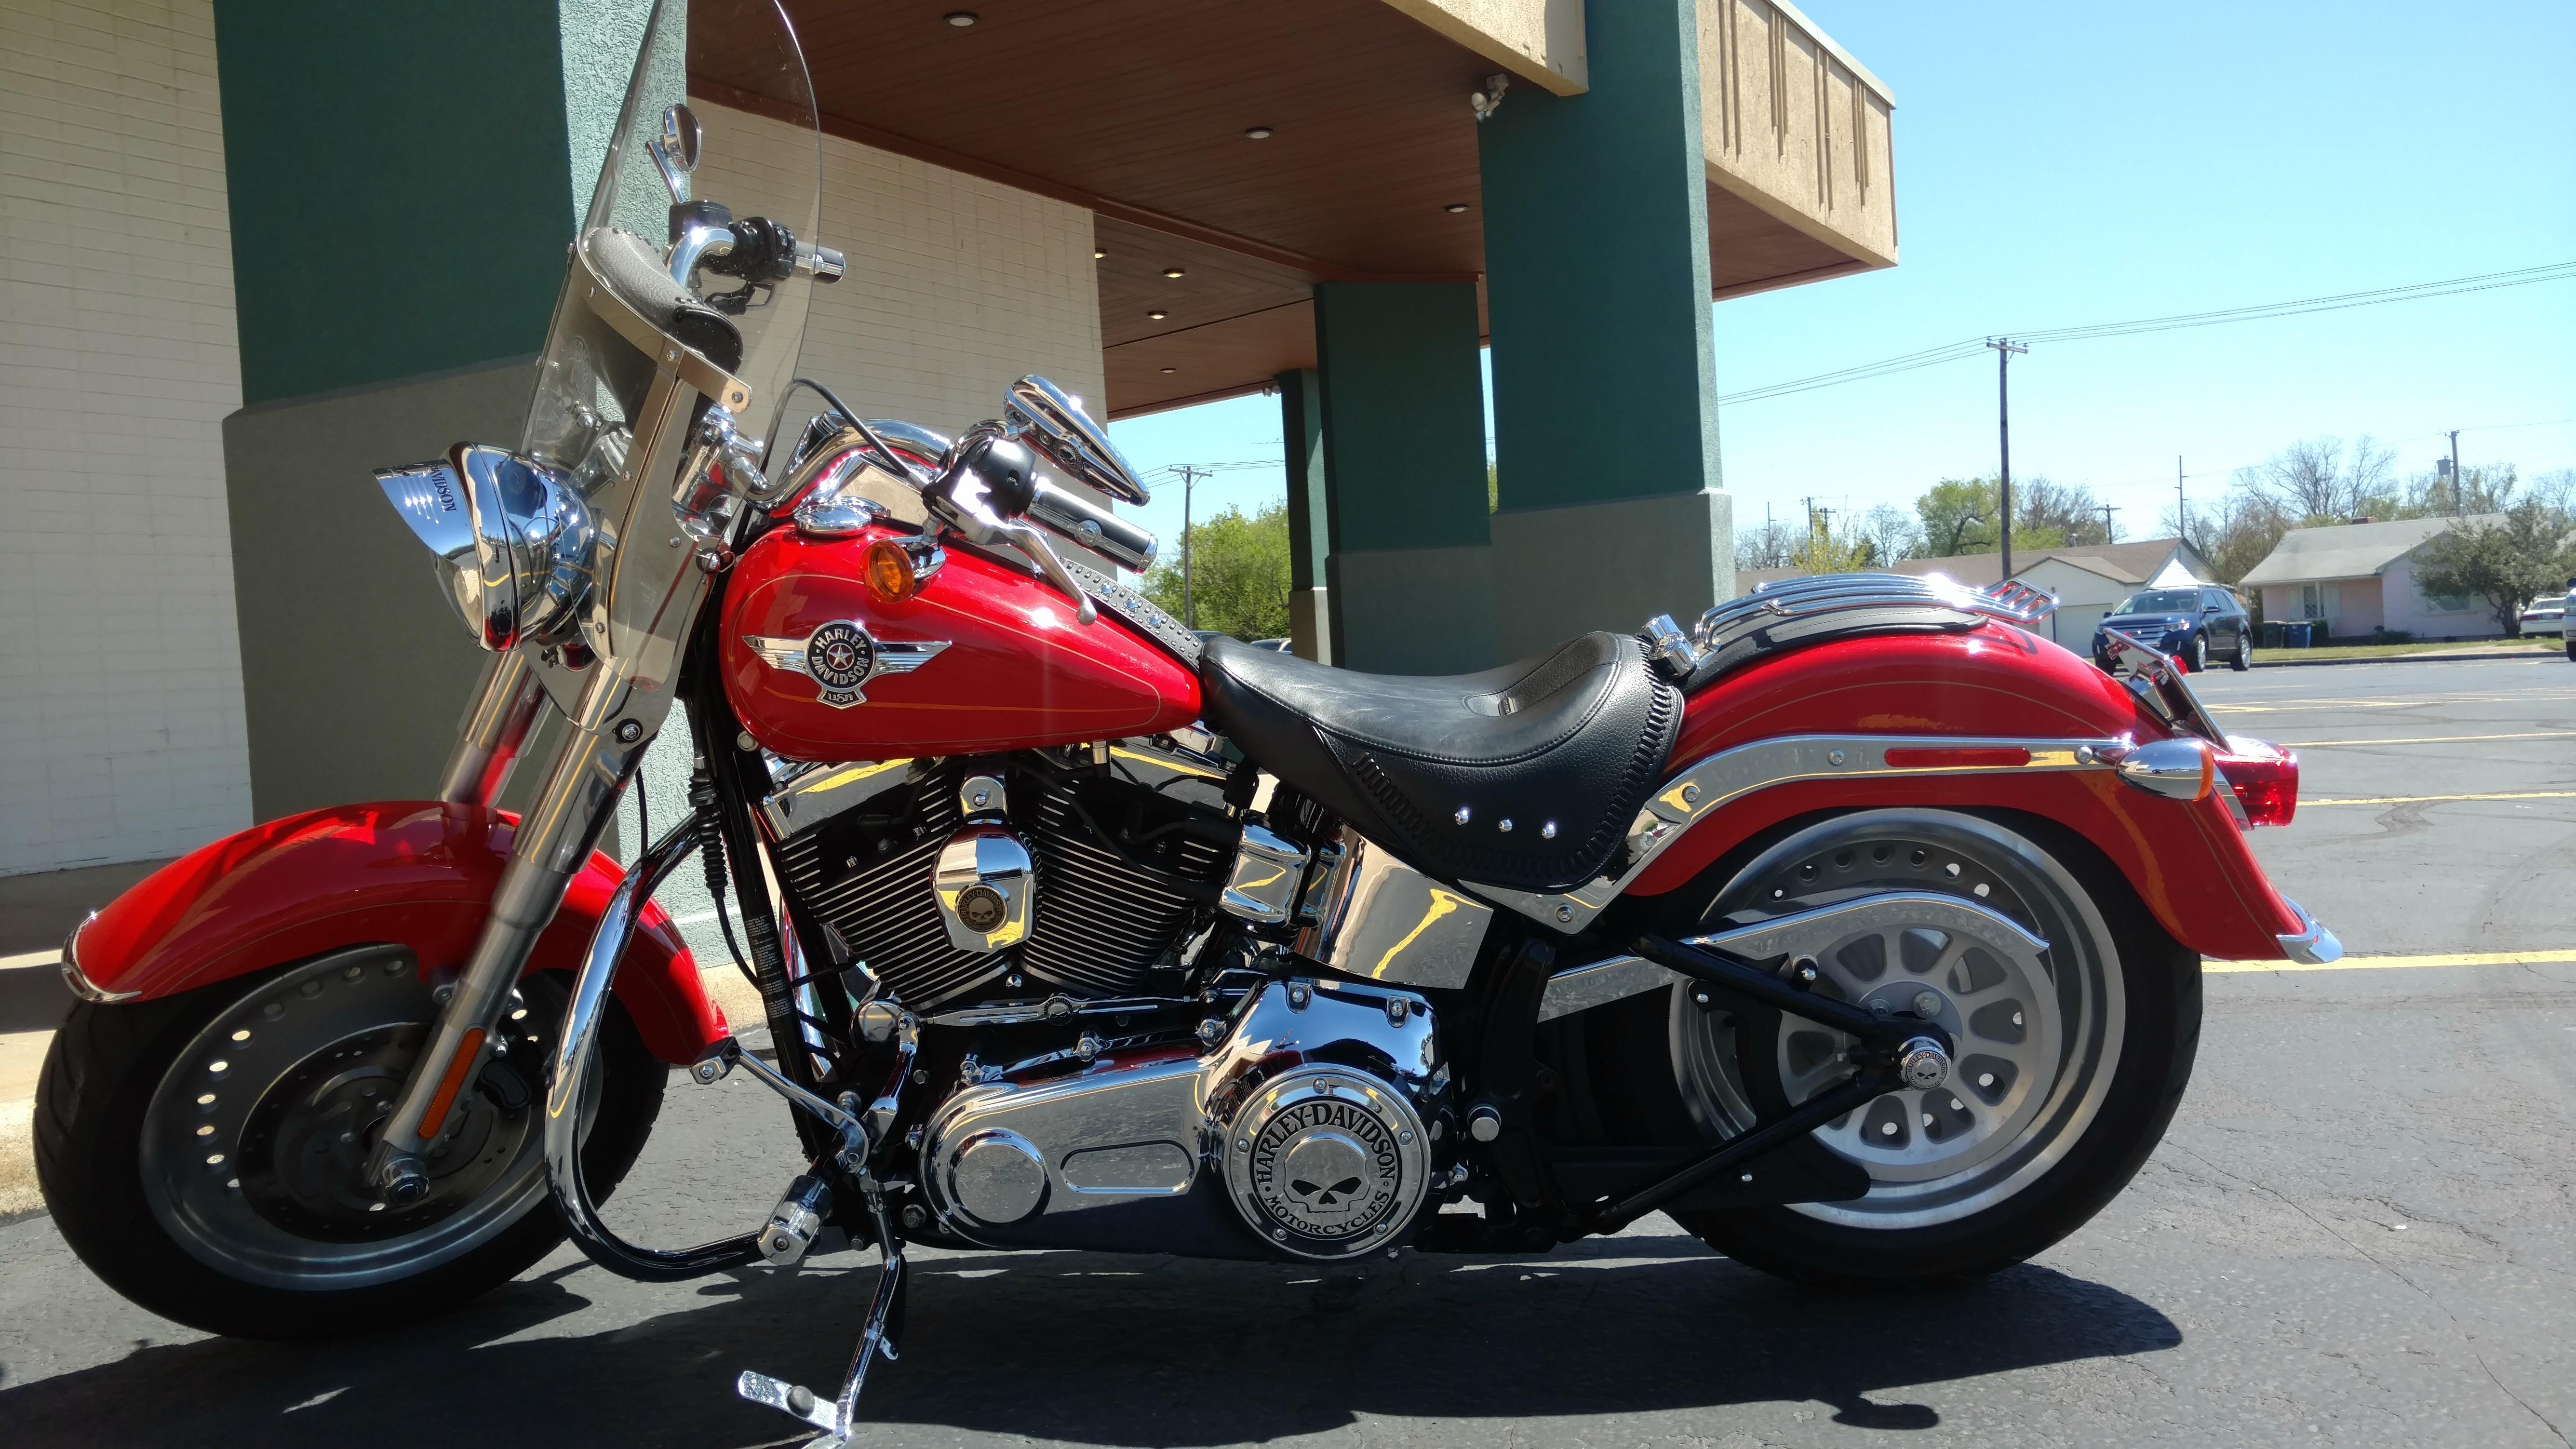 2011 Harley Davidson 174 Flstf Softail 174 Fat Boy 174 Red